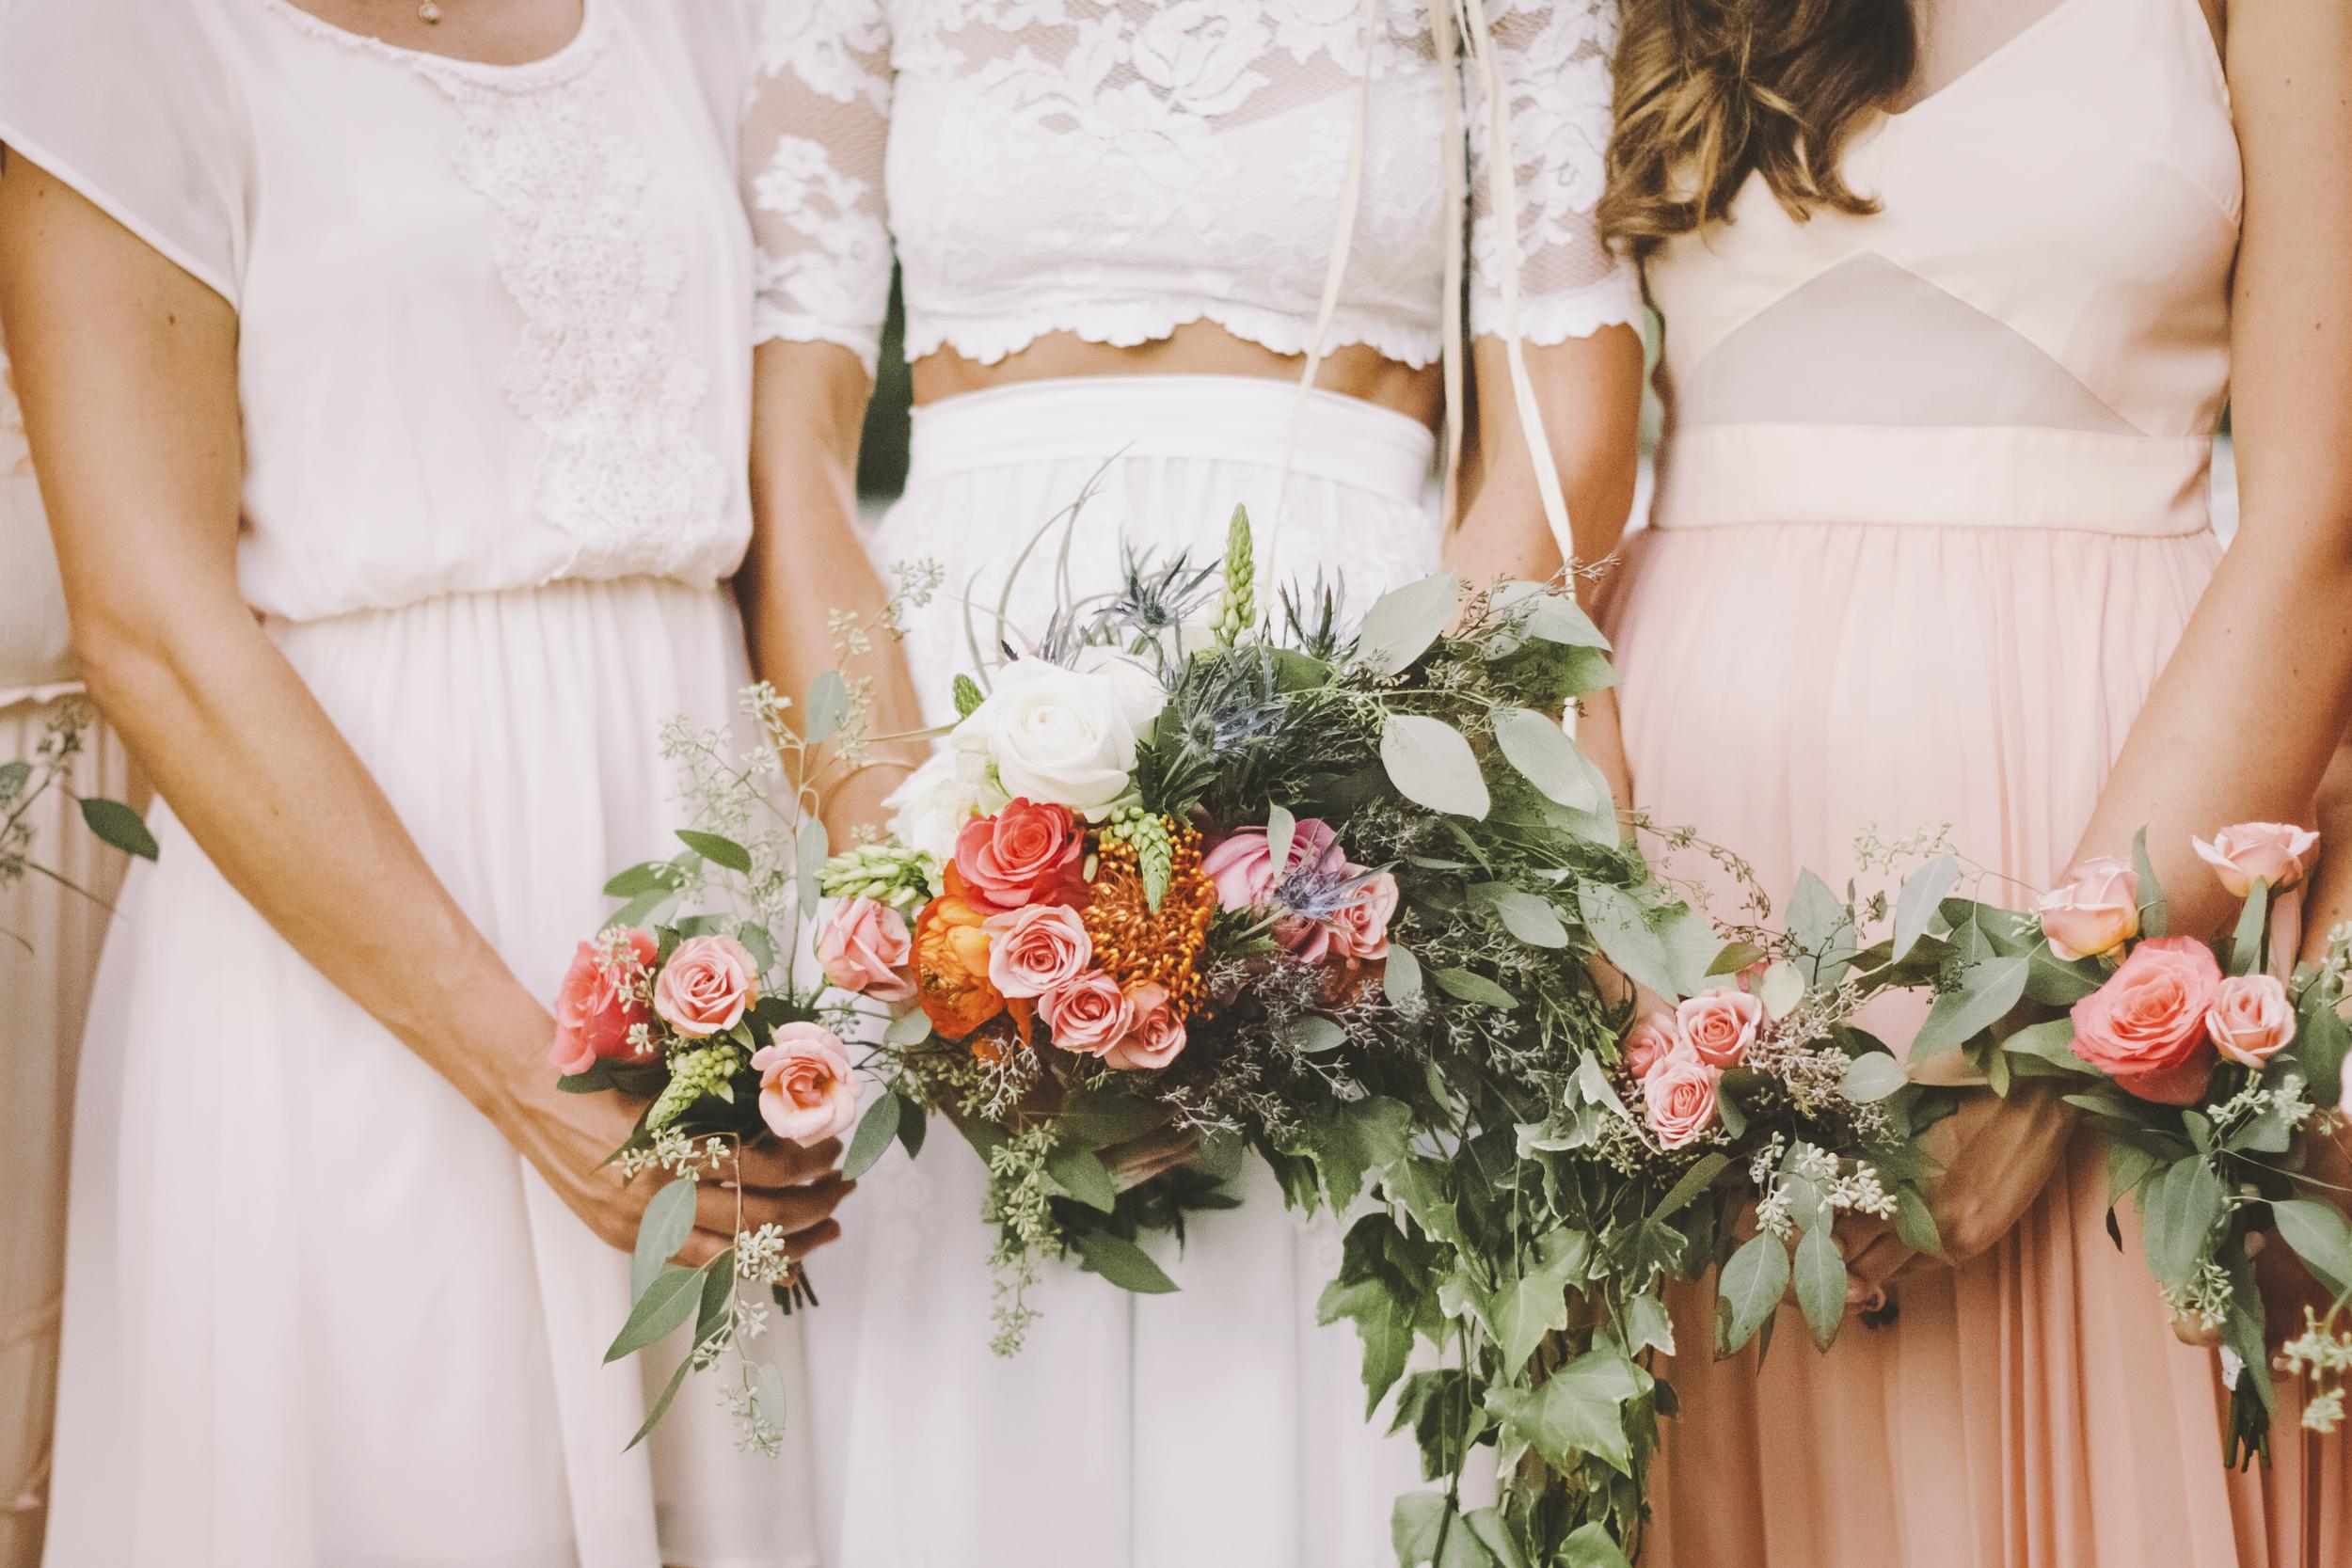 angie-diaz-photography-oahu-hawaii-wedding-tradewinds-ranch-71.jpg